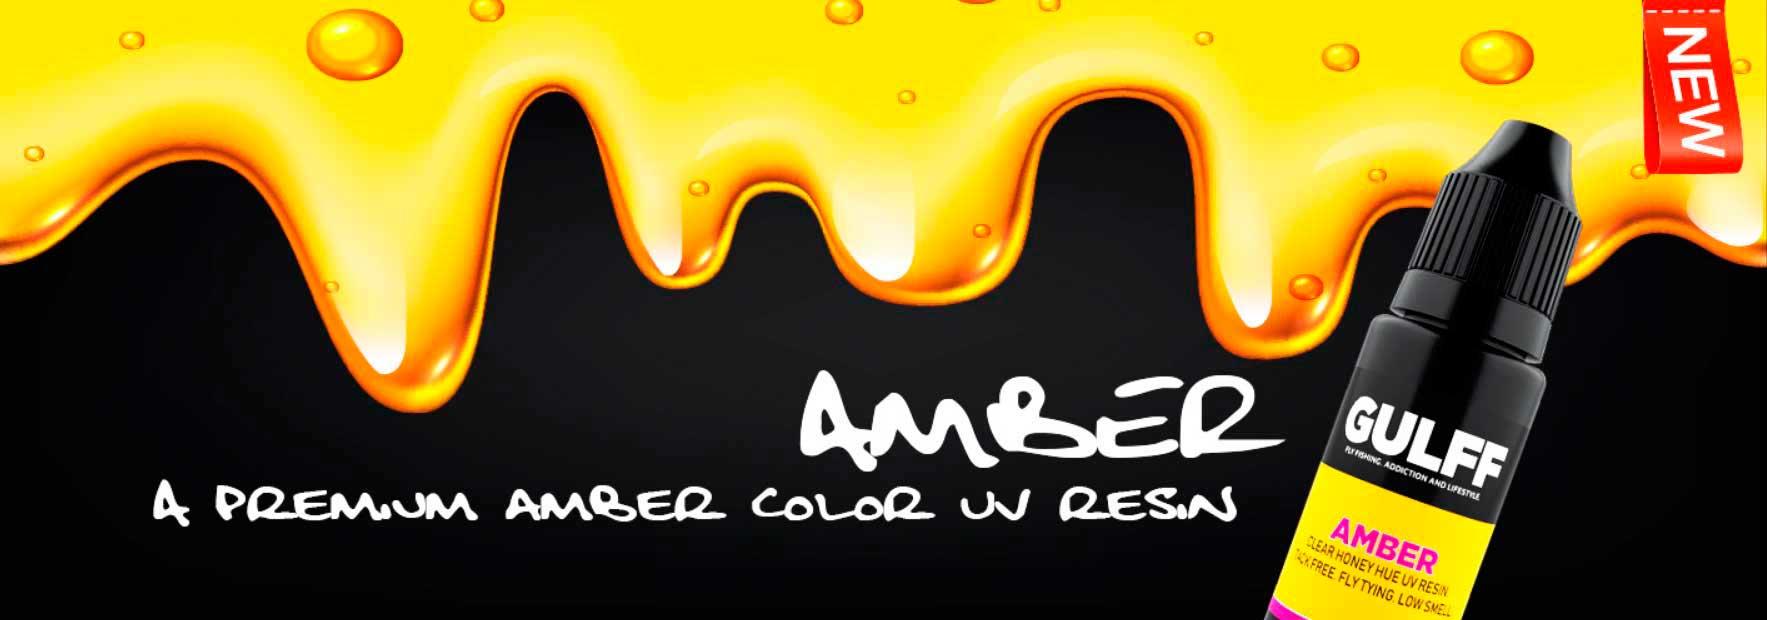 barniz-resina-uv-gulff-amber